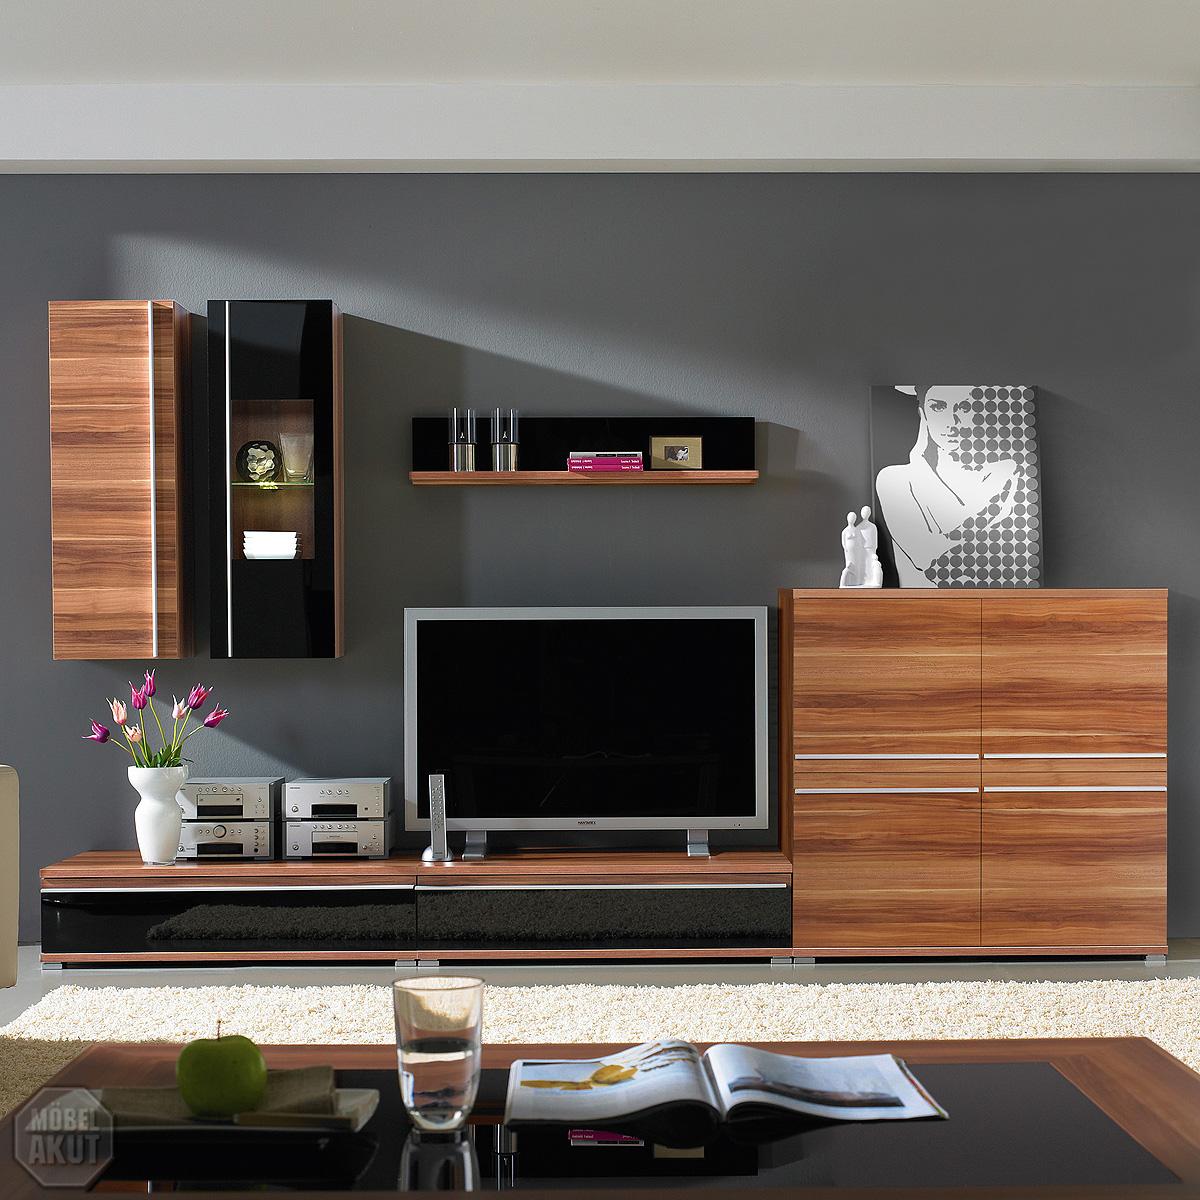 wohnwand pace 3 anbauwand walnuss schwarz glas neu ebay. Black Bedroom Furniture Sets. Home Design Ideas